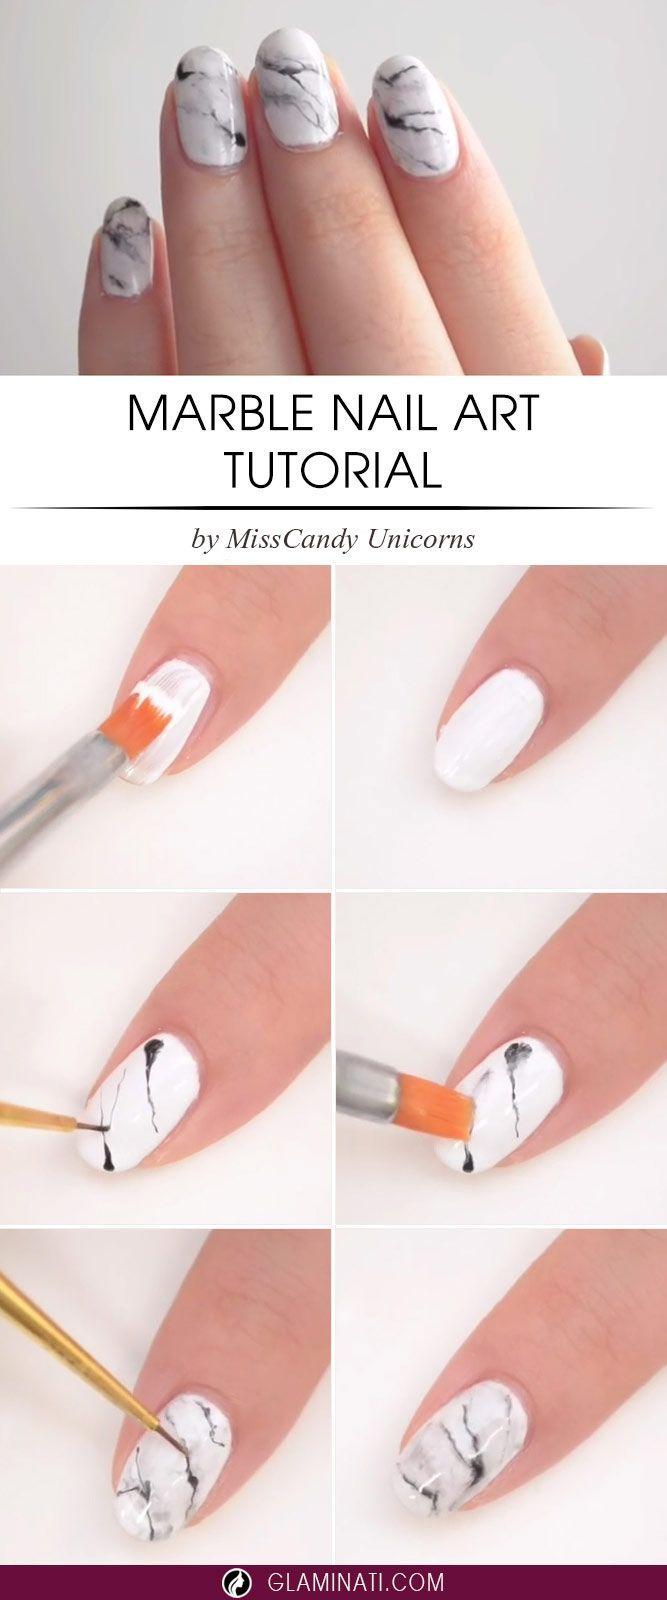 16 Three Step Easy Nail Designs And Tutorials You Will Absolutely Love Nail Designs Easy Diy Simple Nails Diy Nail Designs